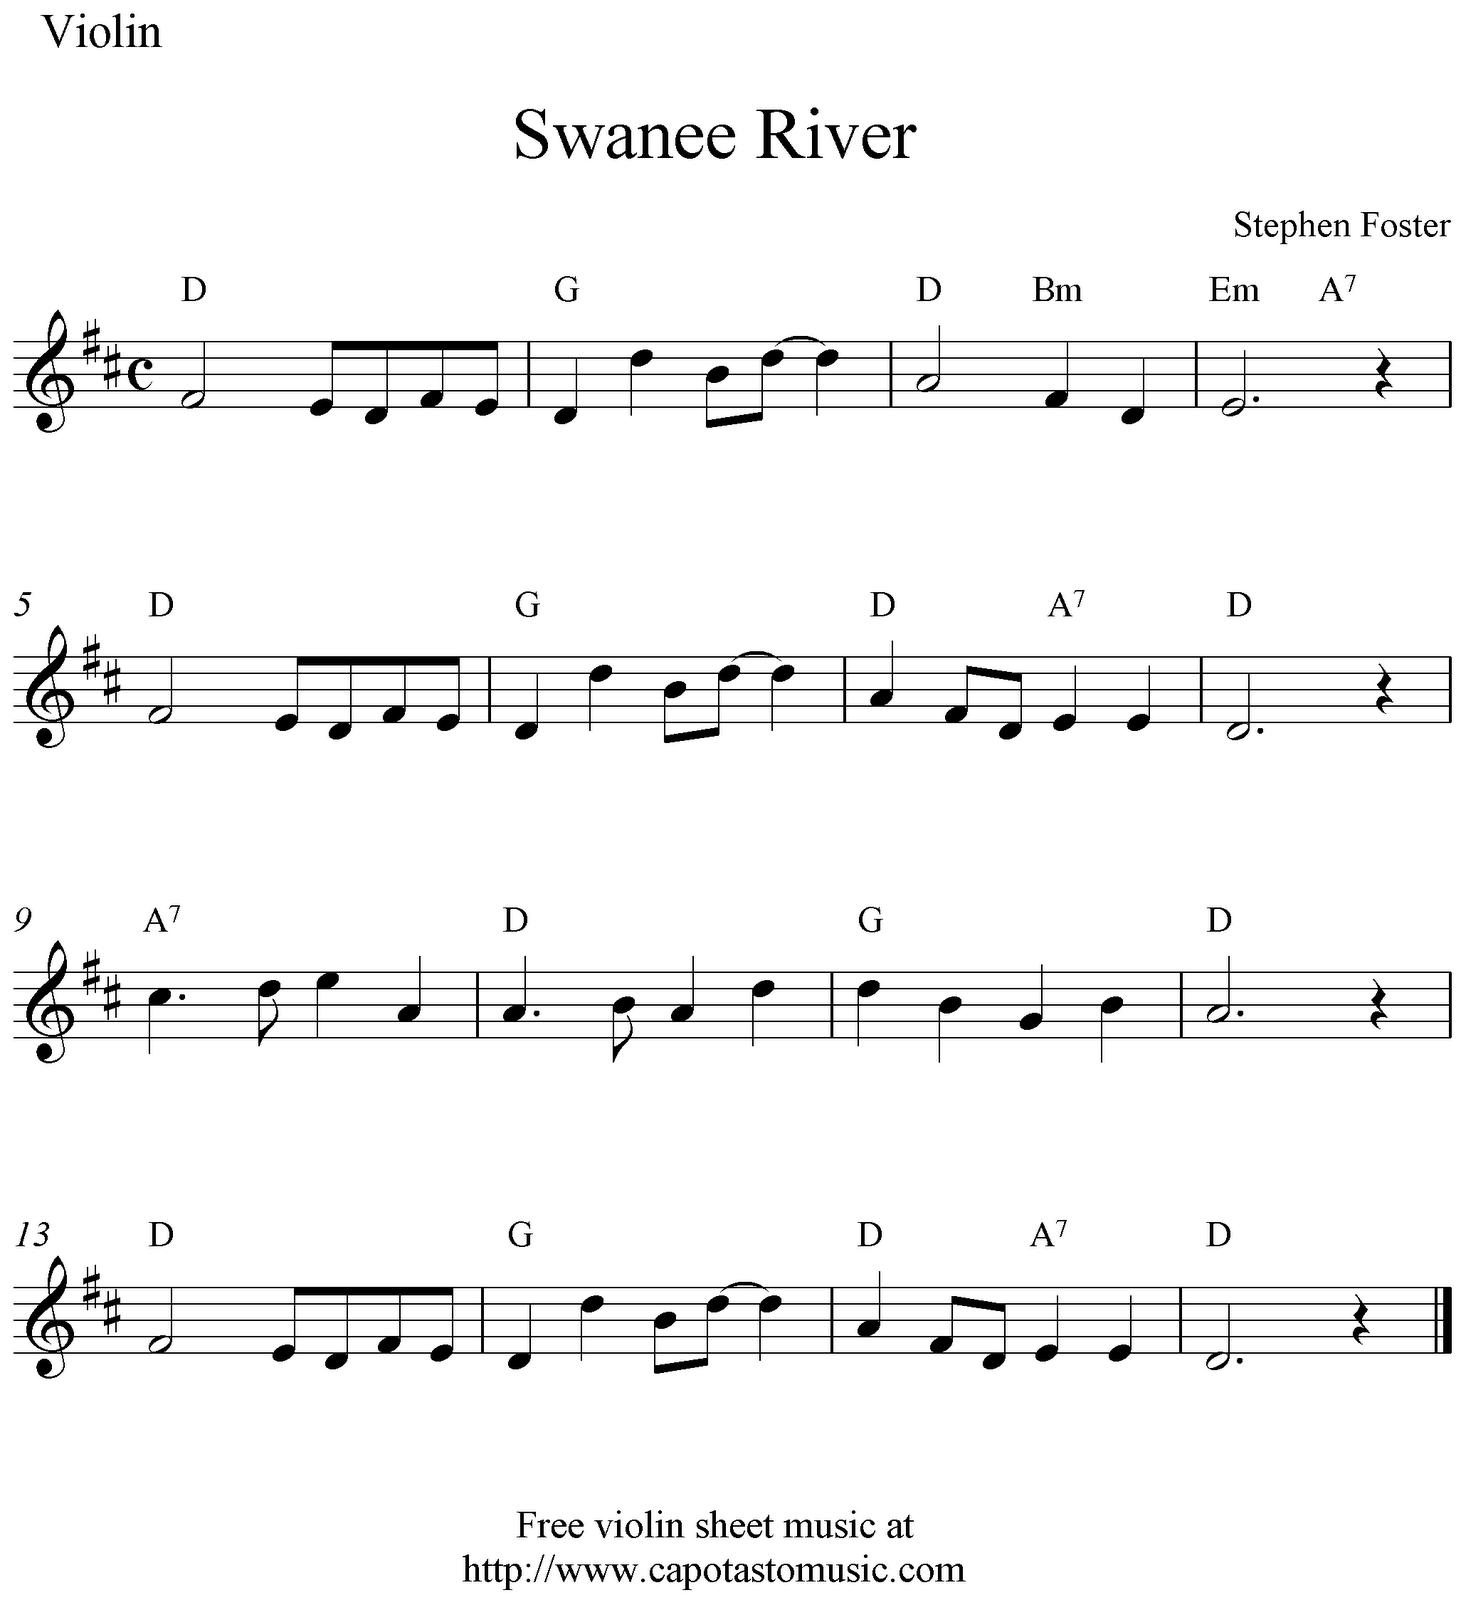 Free Christmas Violin Sheet Music O: Swanee River, Free Violin Sheet Music Notes